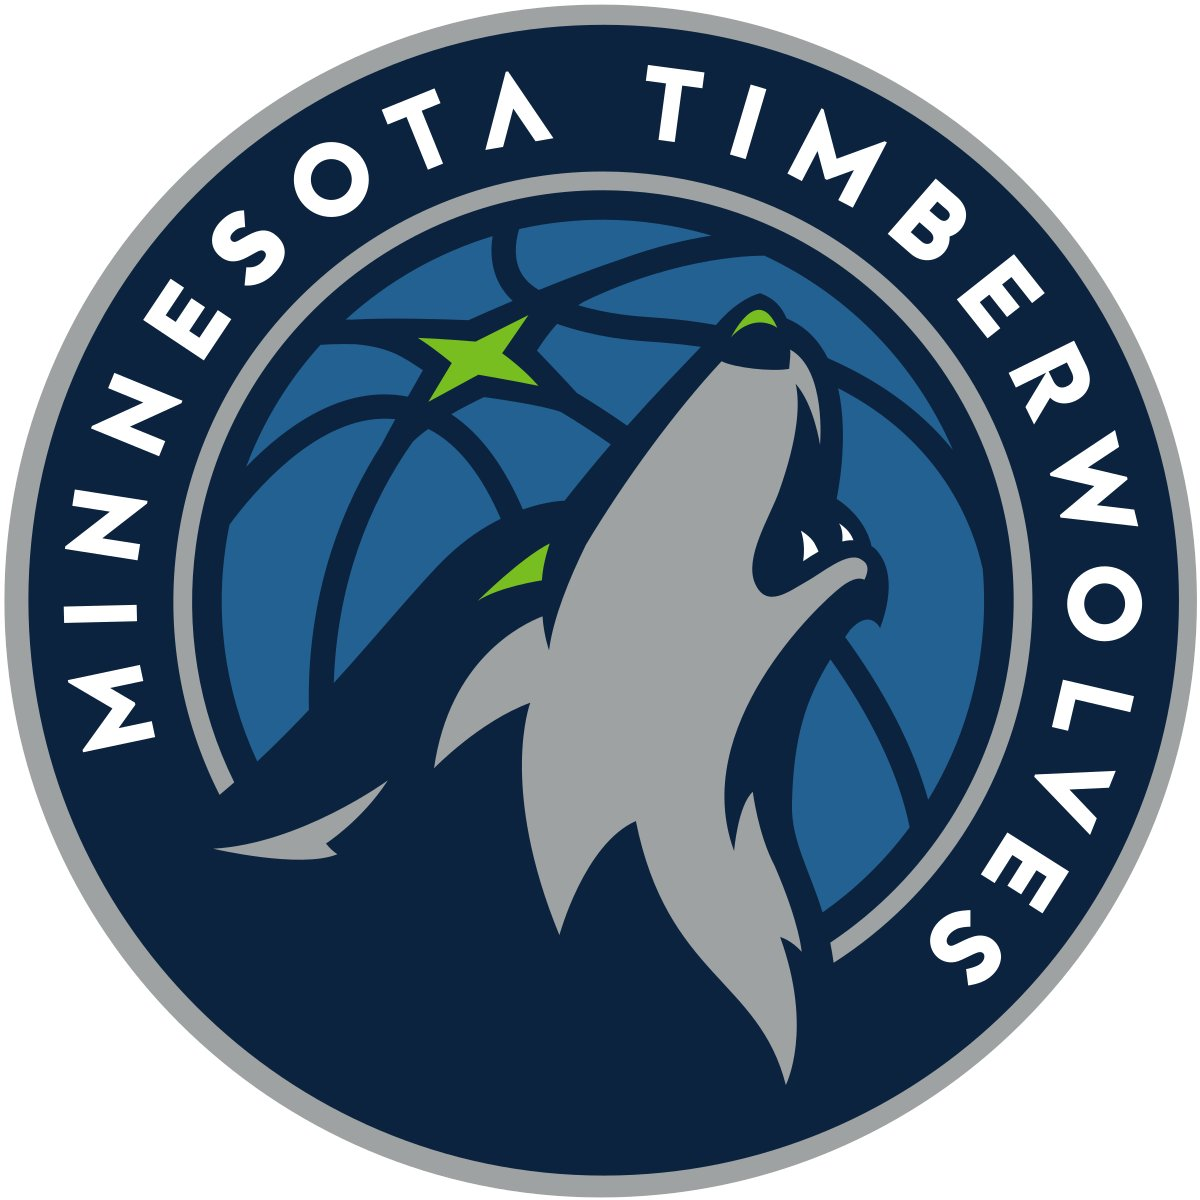 Minnesota Timberwolves (3-8) vs Memphis Grizzlies (5-6) 2AM CET / 8PM ET D'Angelo Russell (MIN) - 20.7 PTS / 3.2 REB / 5.5 ASI Jonas Valanciunas (MEM) - 14.9 PTS / 10.7 REB / 1.8  #NBA #NBATwitter https://t.co/EgyyjRRPTW